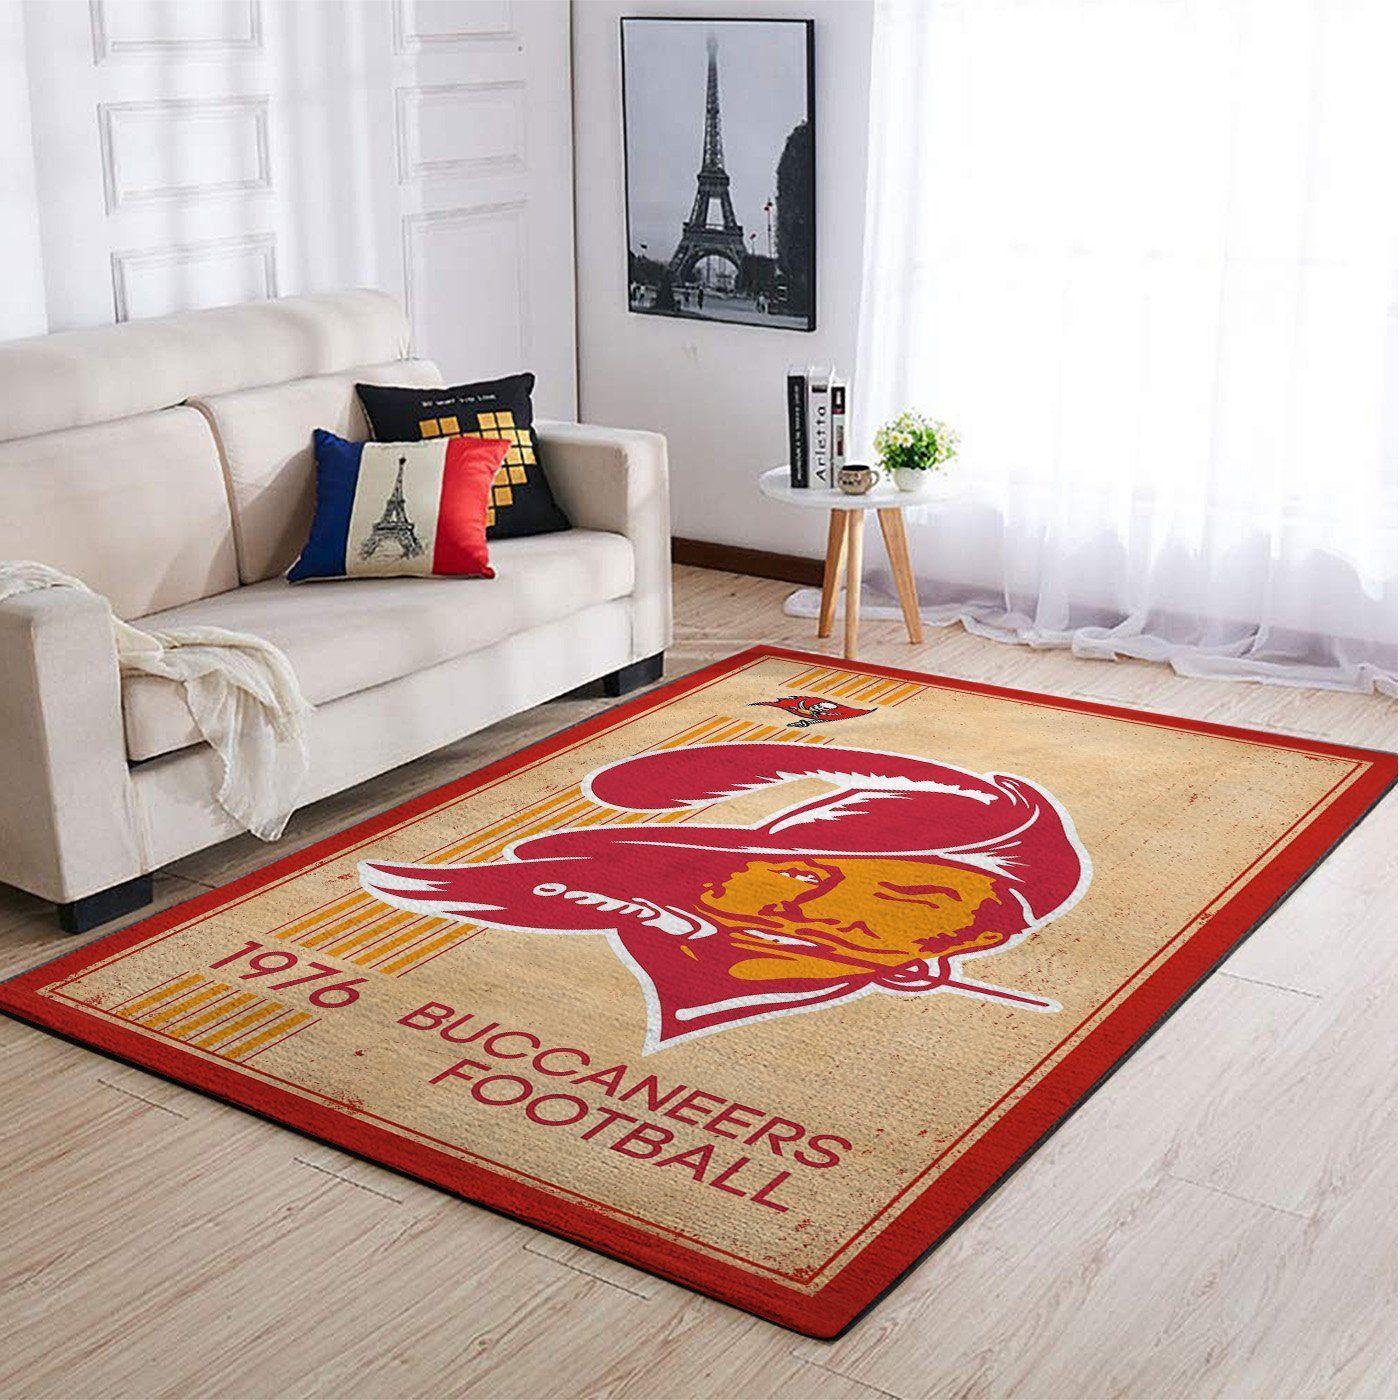 Amazon Tampa Bay Buccaneers Living Room Area No5060 Rug